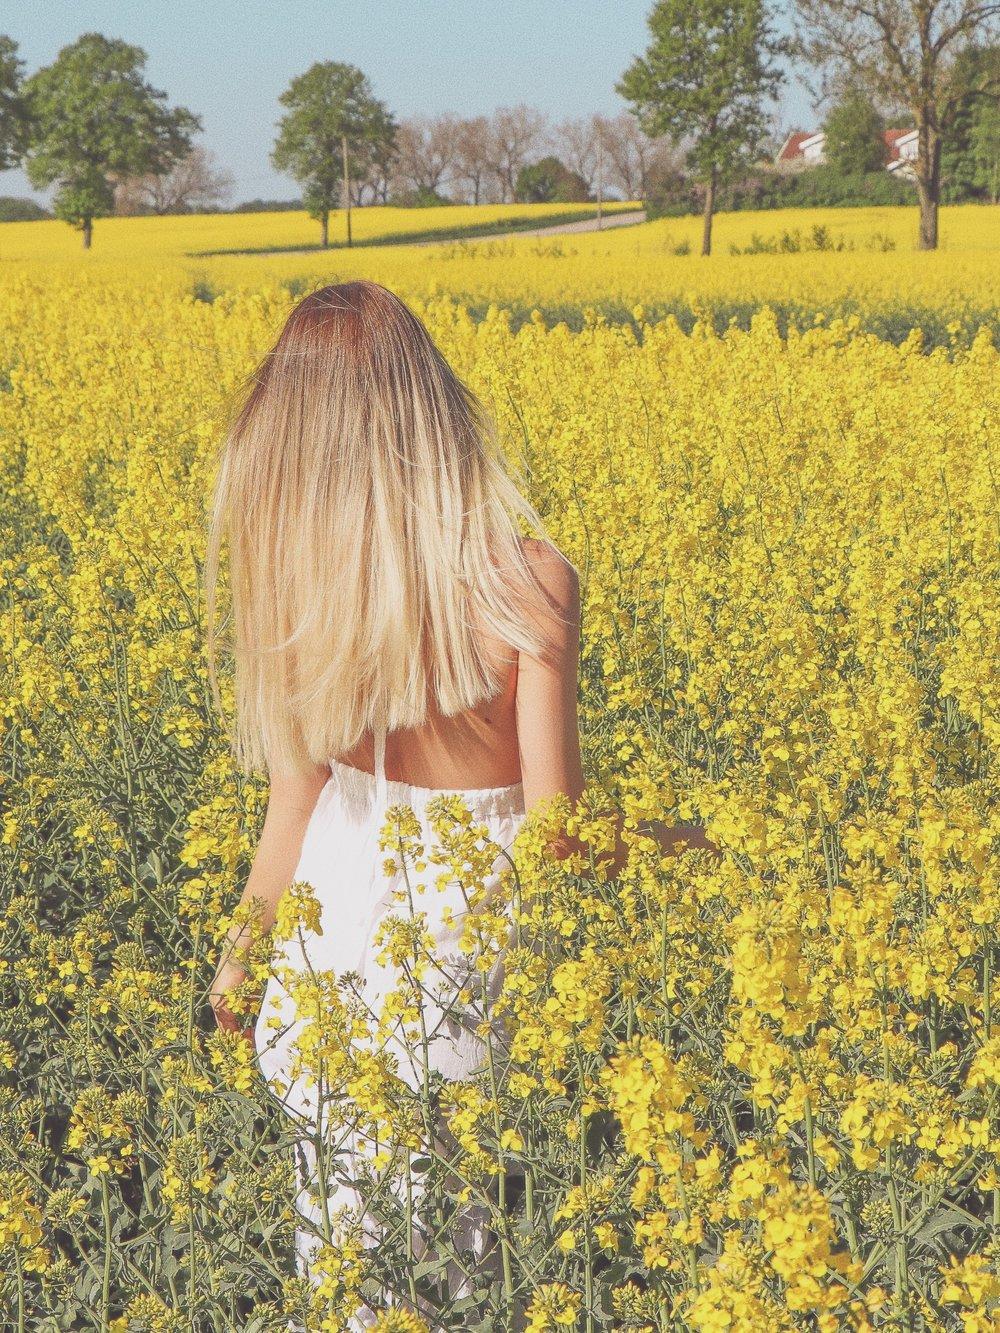 Swedish landscape and fields of gold photo Linda Haggh.jpg